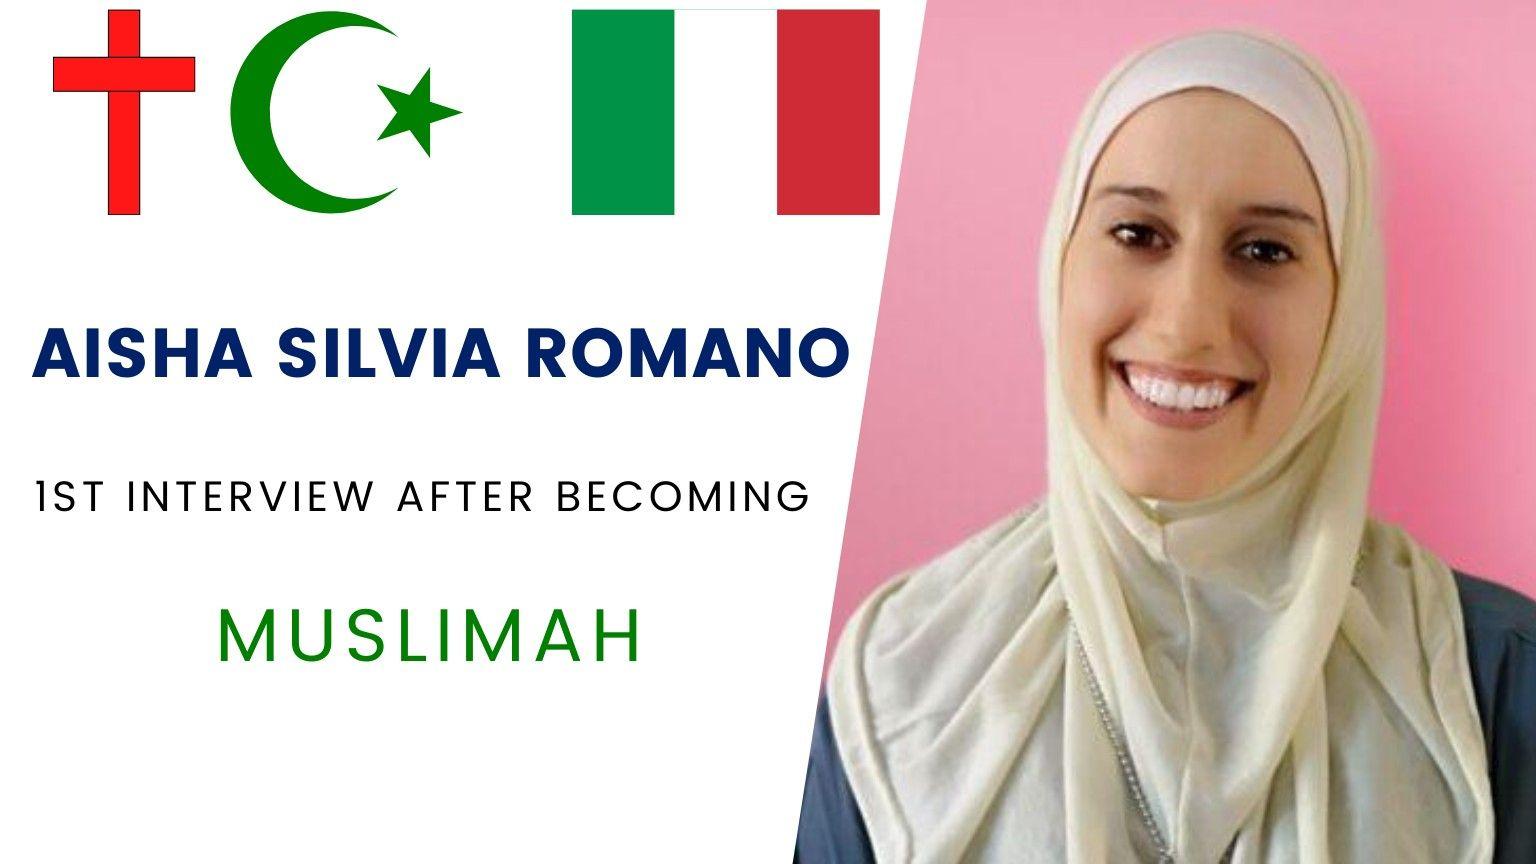 Aisha Silvia Romano 🇮🇹 | First Interview as Muslimah 🧕